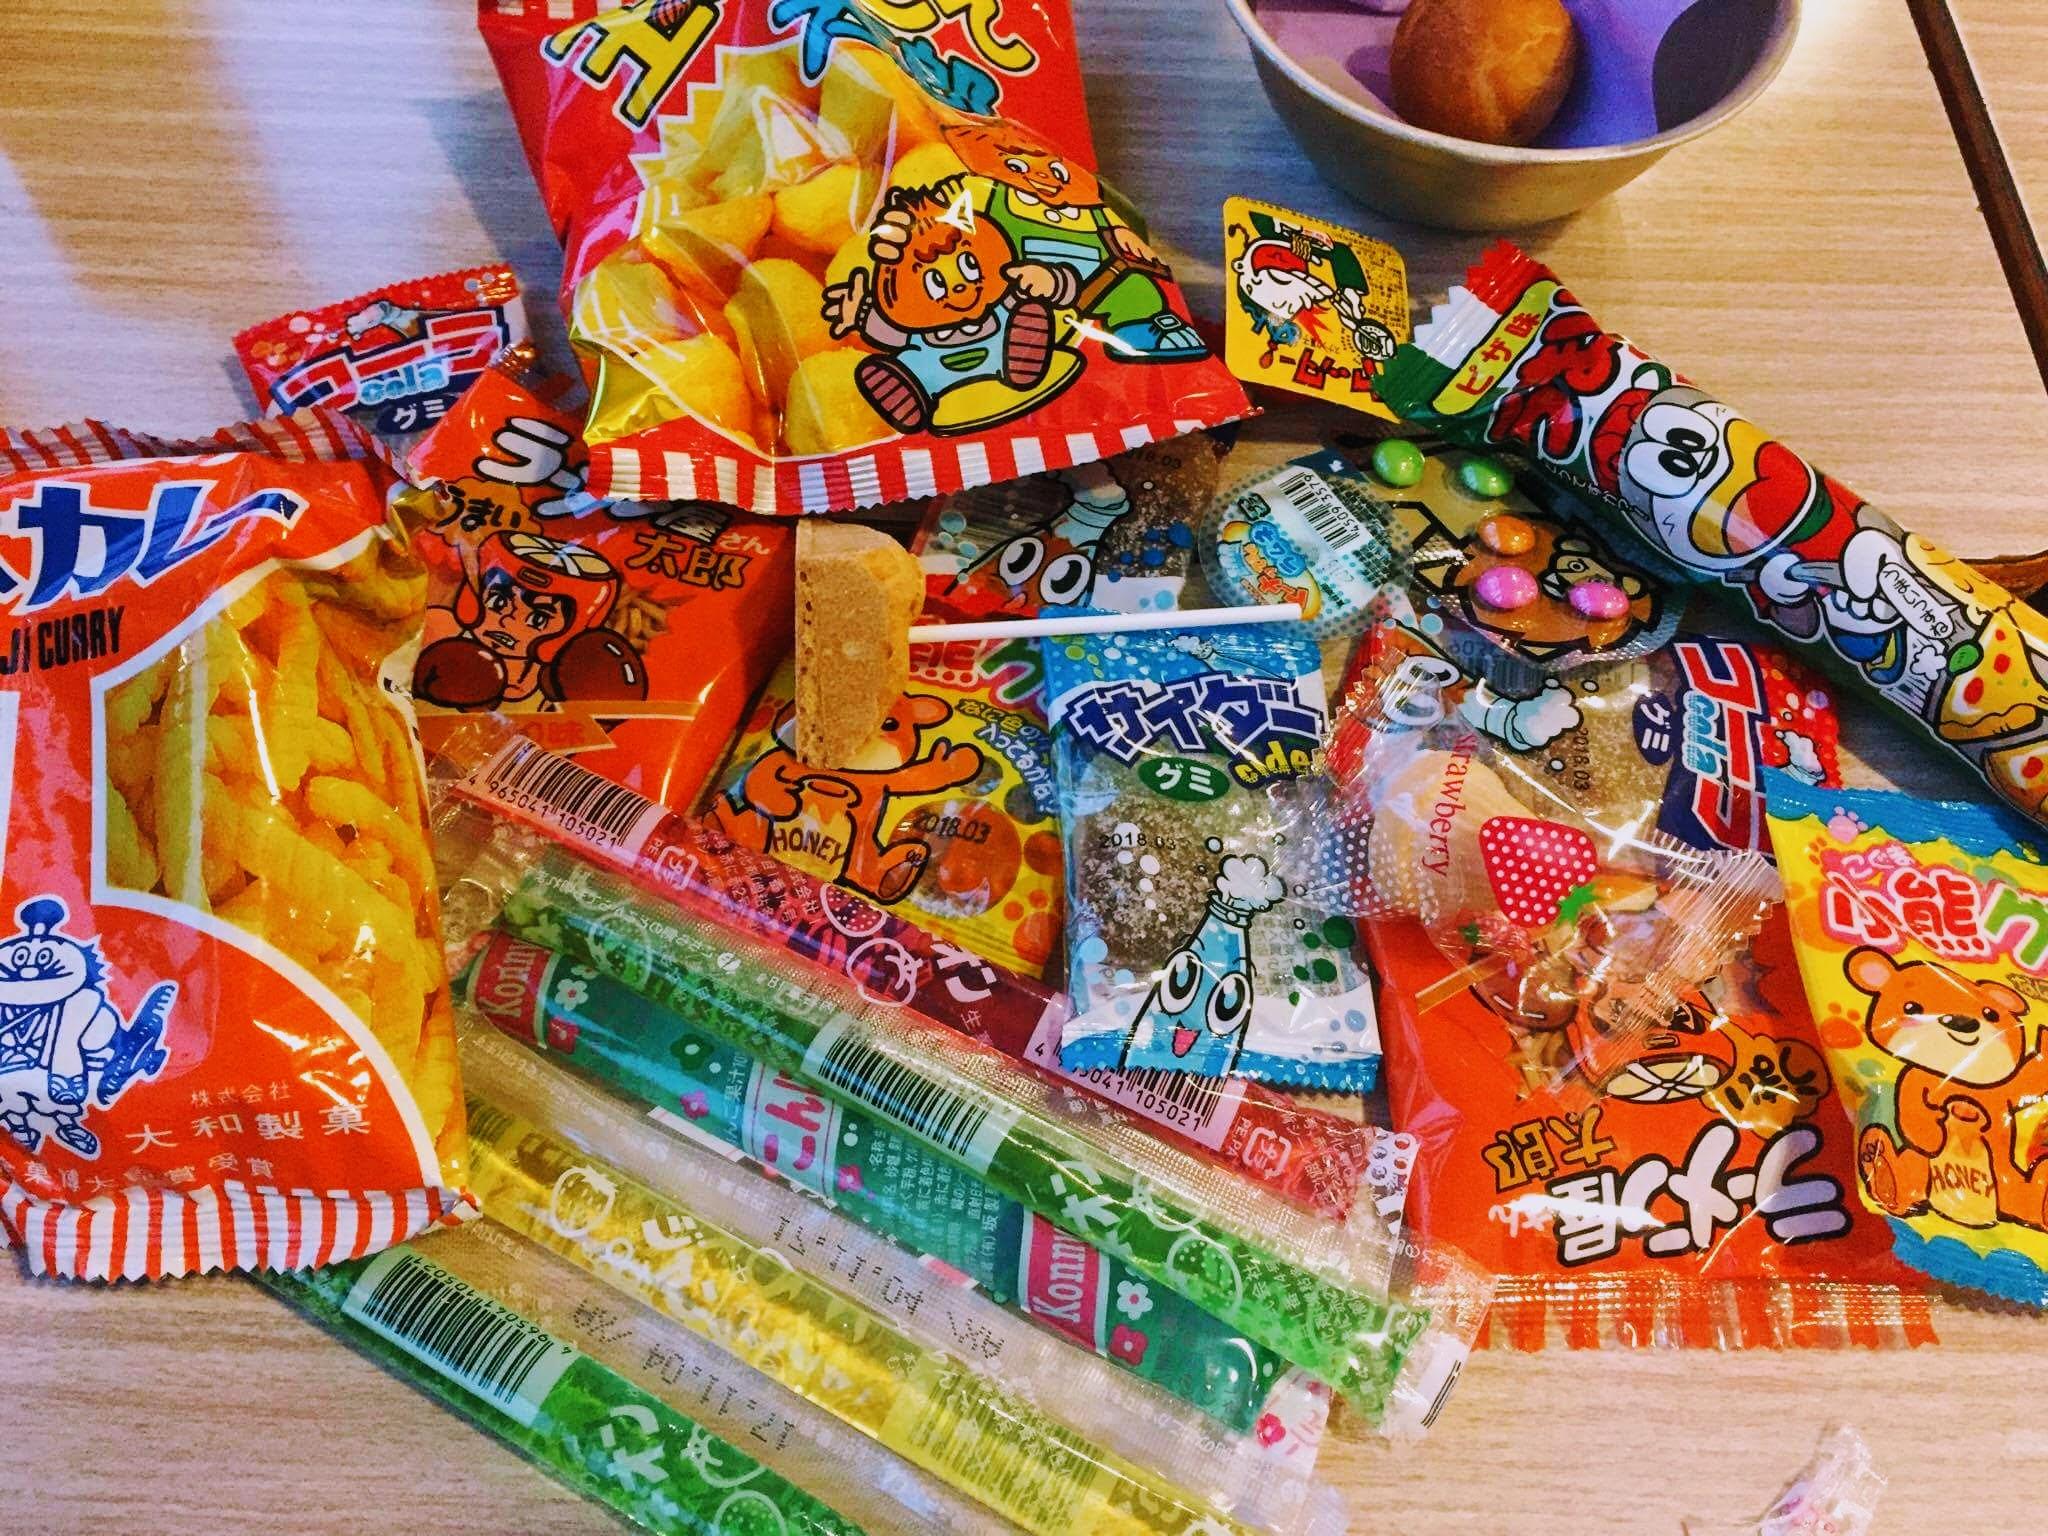 Rokunen Yonkumi Candy